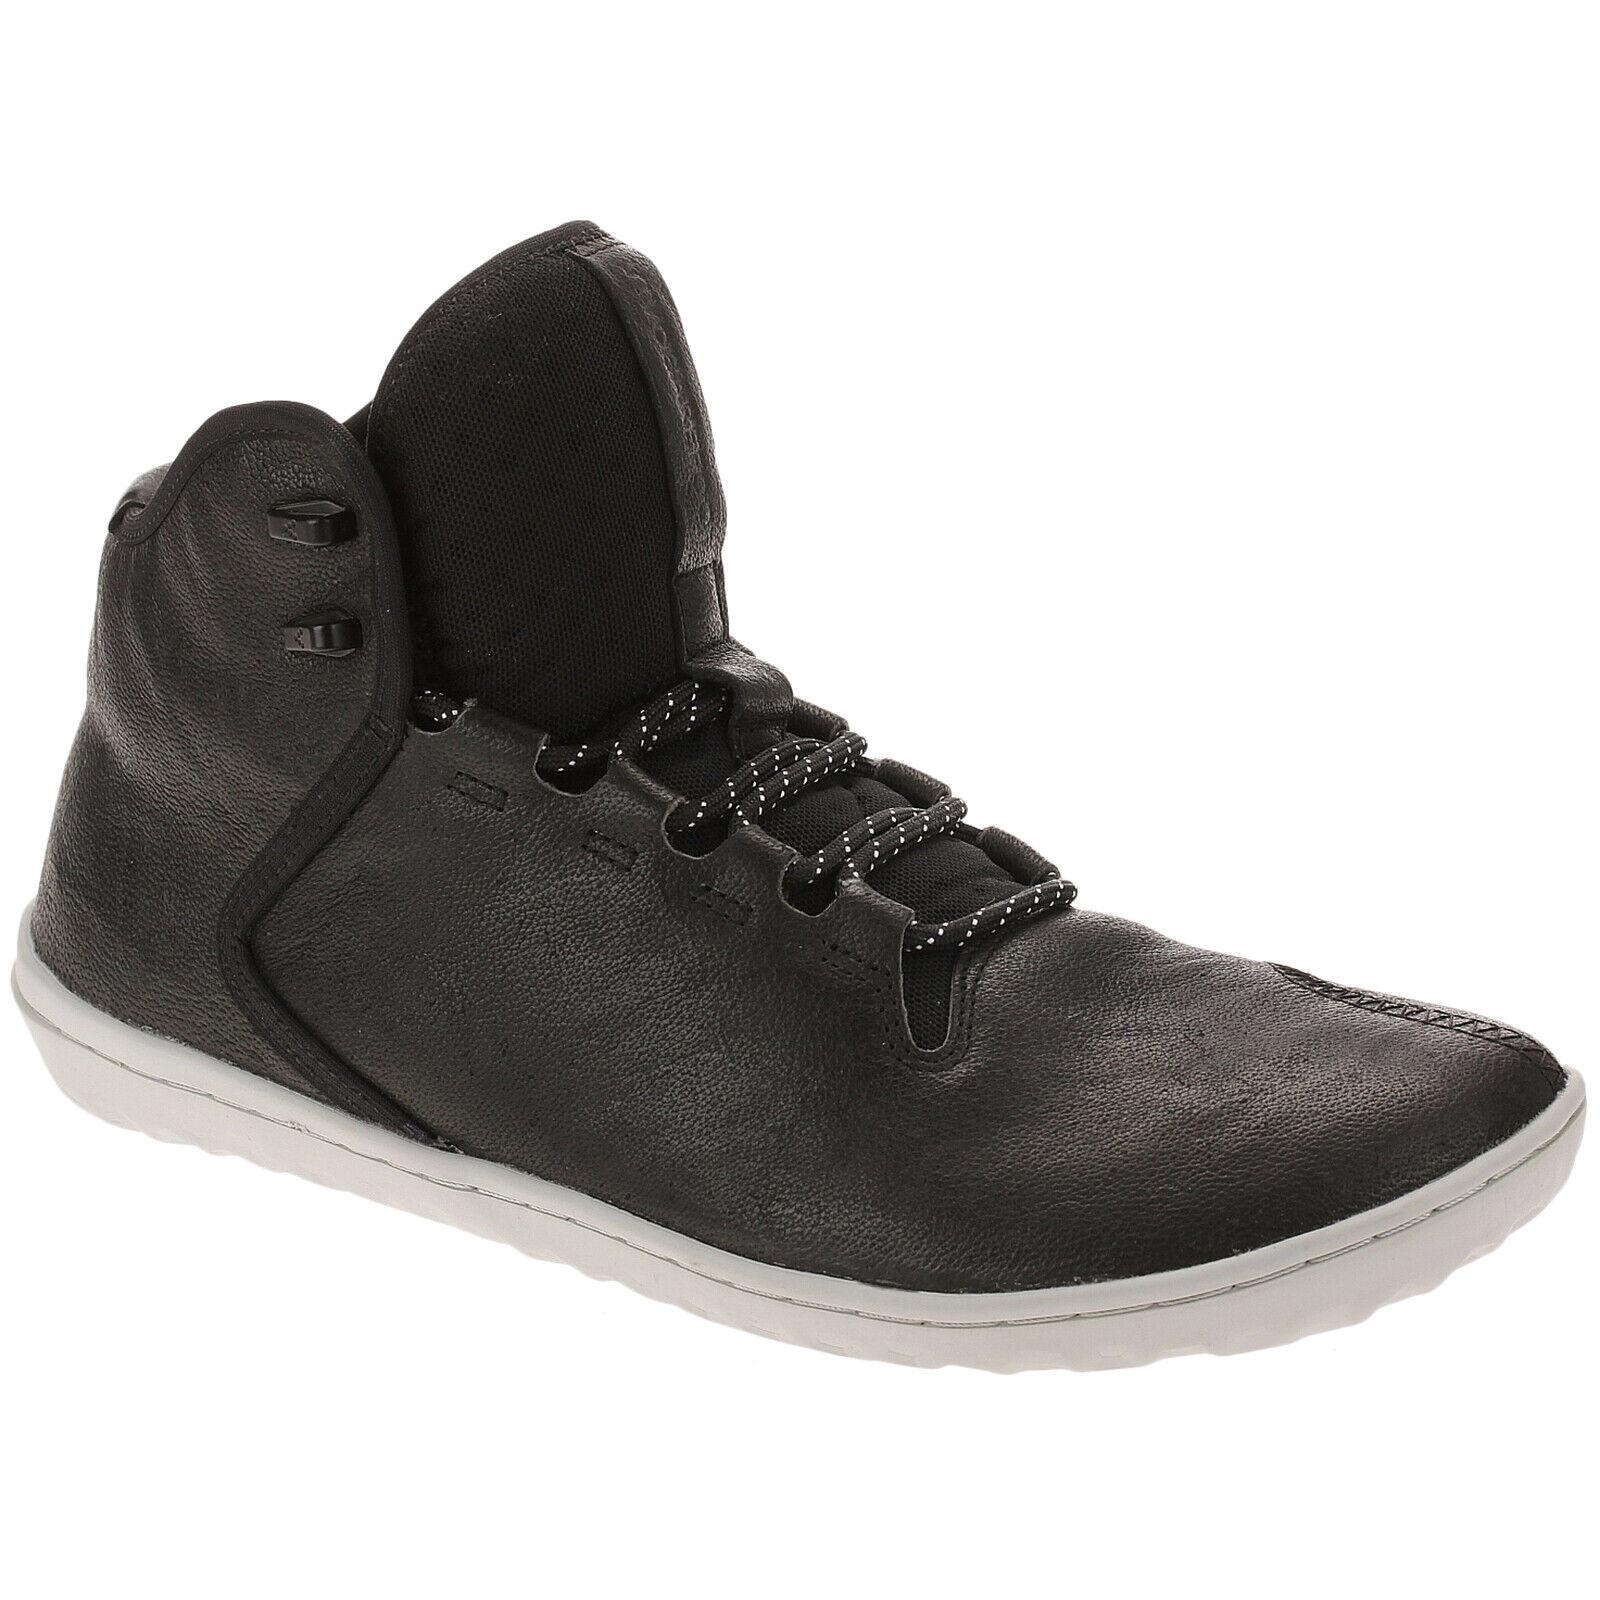 Vivobarefoot Borough cuero hi-top Flat Lace-up casual botín señores entrenador